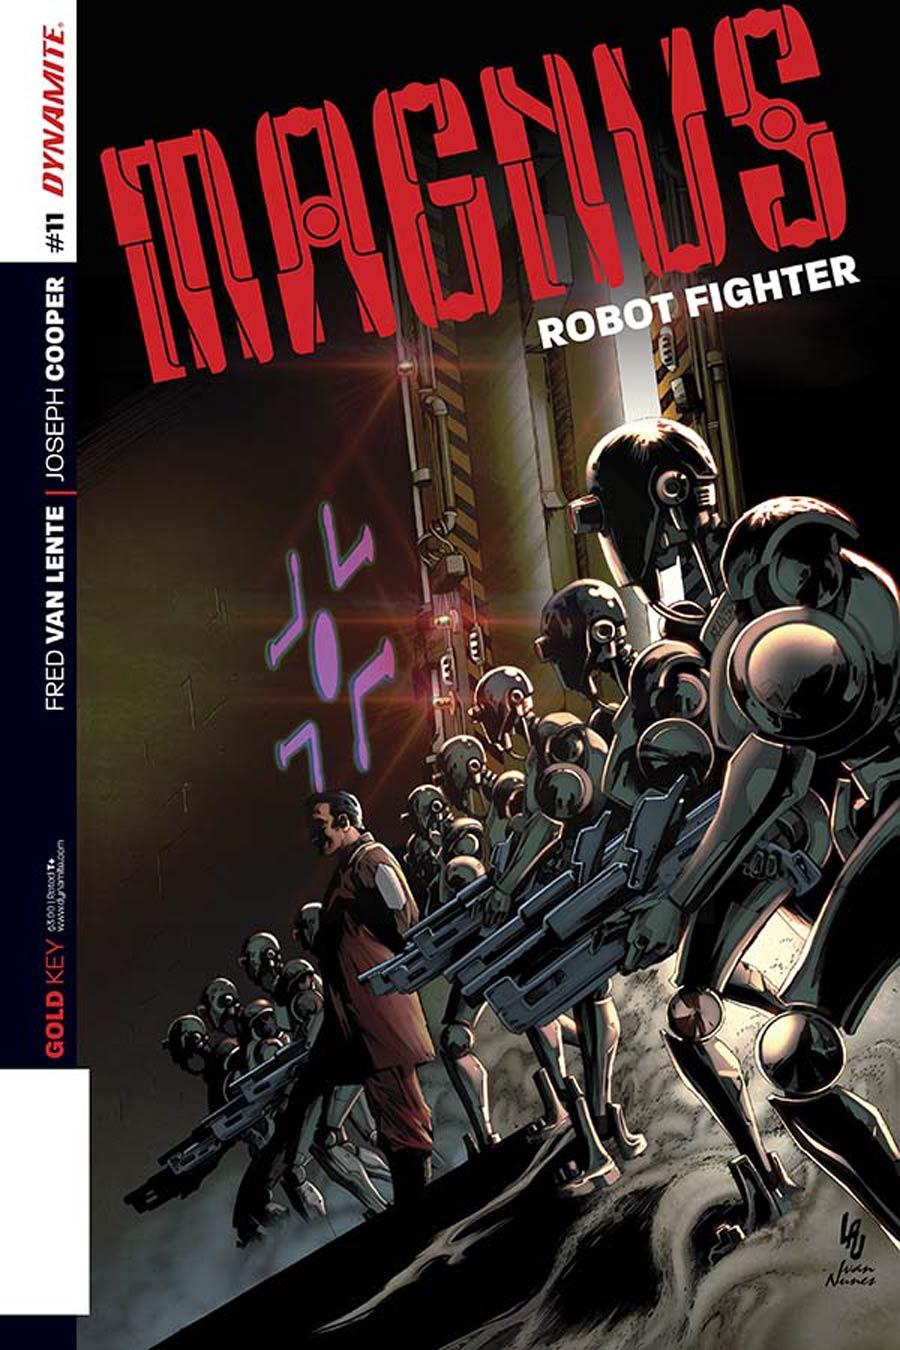 Magnus Robot Fighter Vol 4 #11 Cover A Regular Jonathan Lau Cover